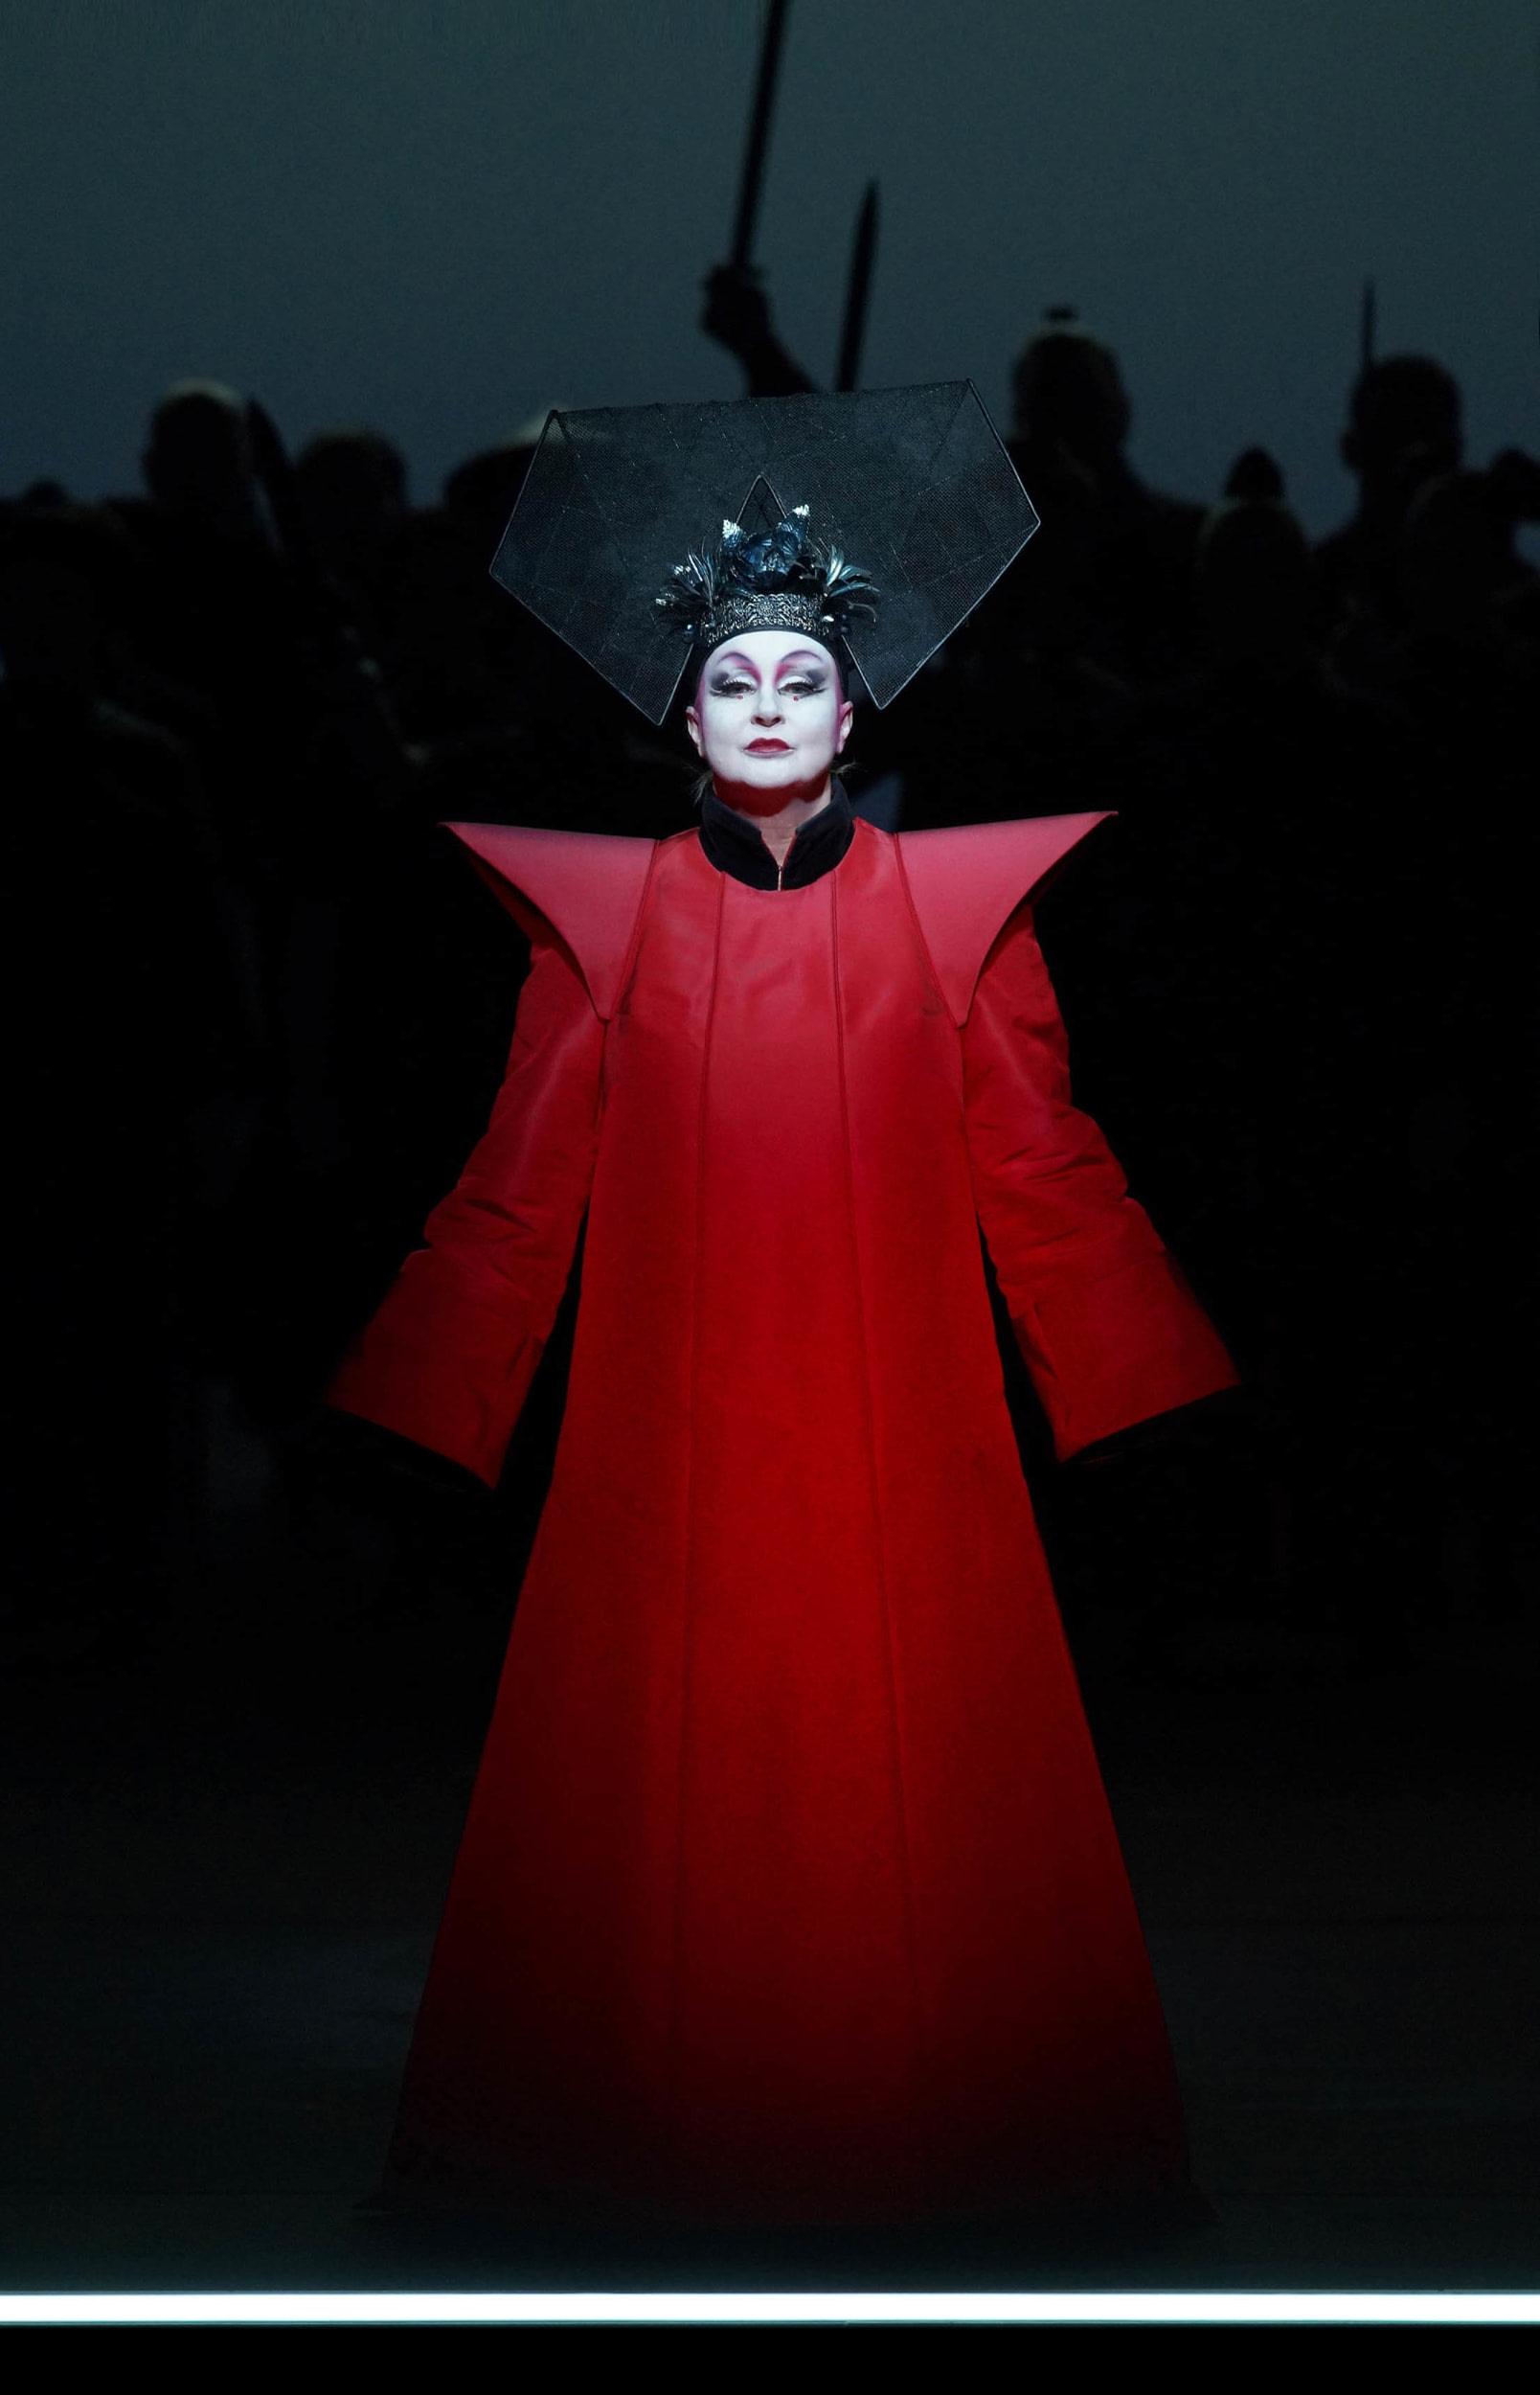 Turandot 4575